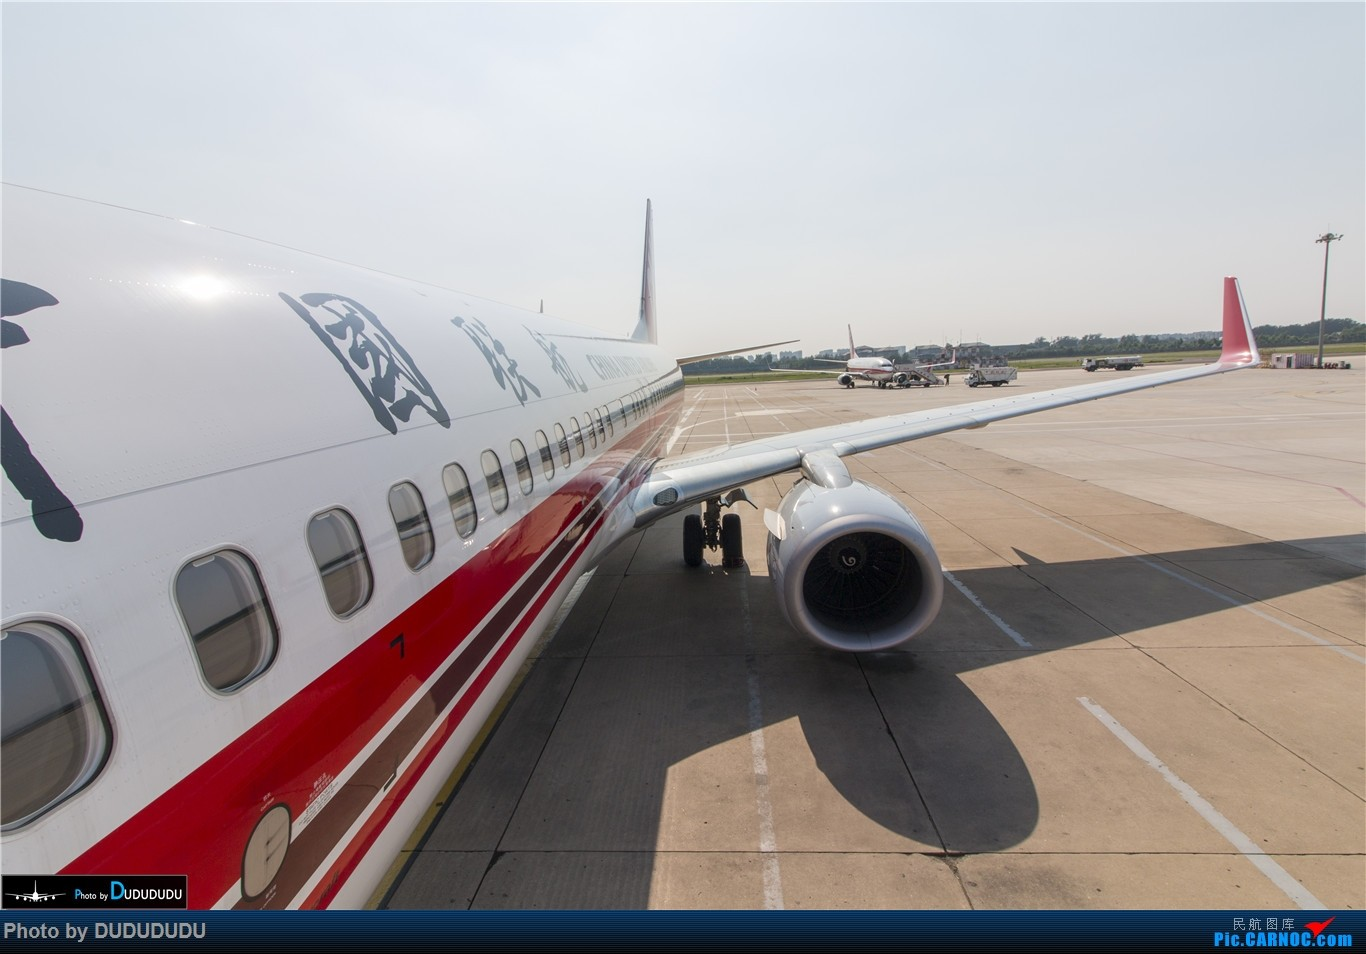 Re:[原创]【DUDUDUDU】暑期飞行合集 从A388到MA60 BOEING 737-800 B-7563 中国北京南苑机场